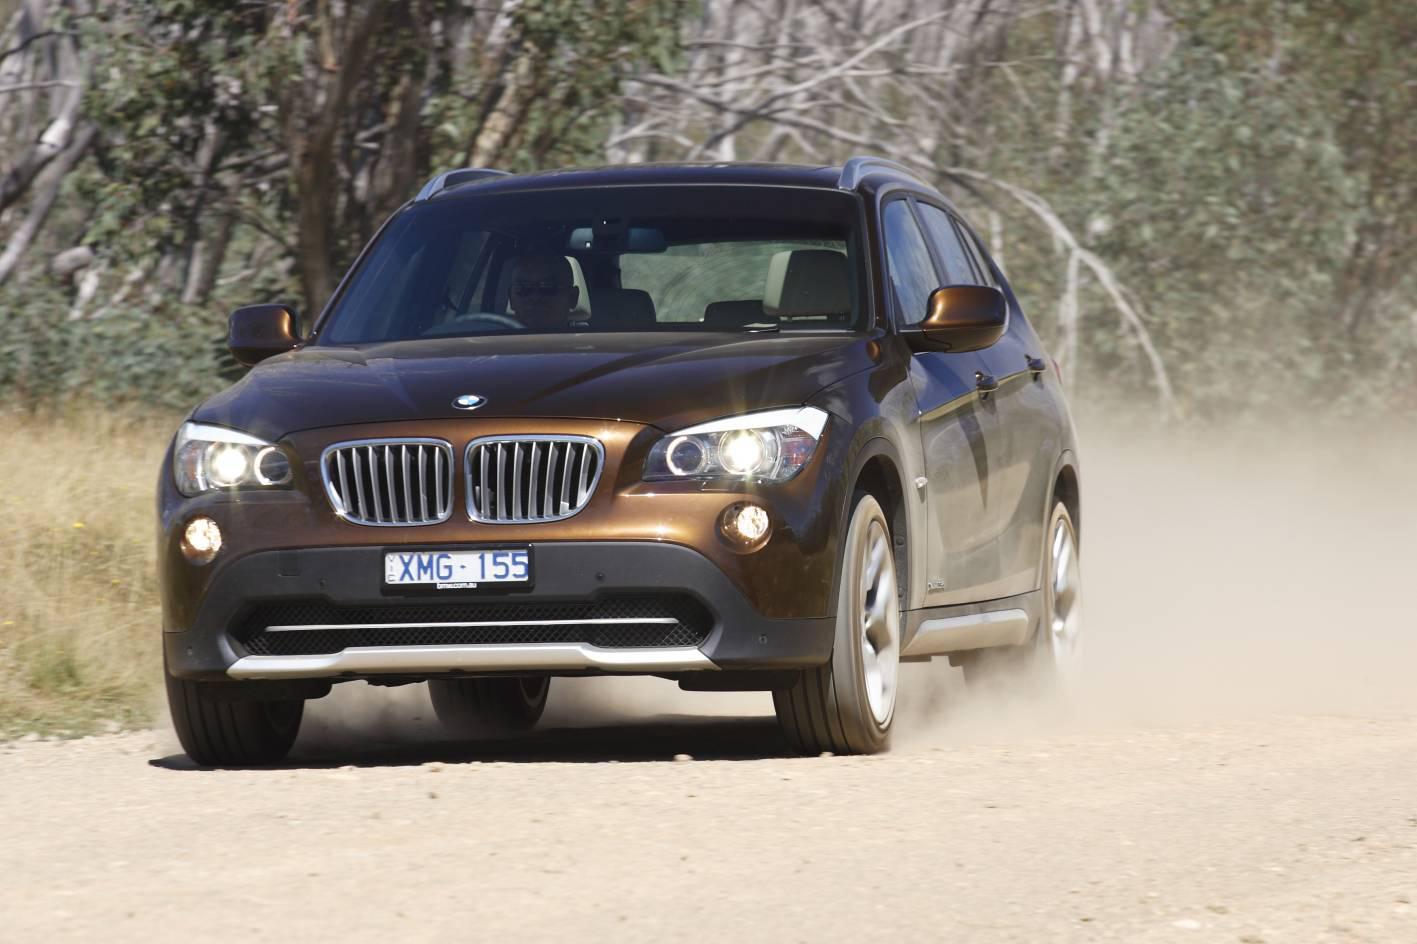 2010_bmw_x1_123d_road_test_review_australia_12